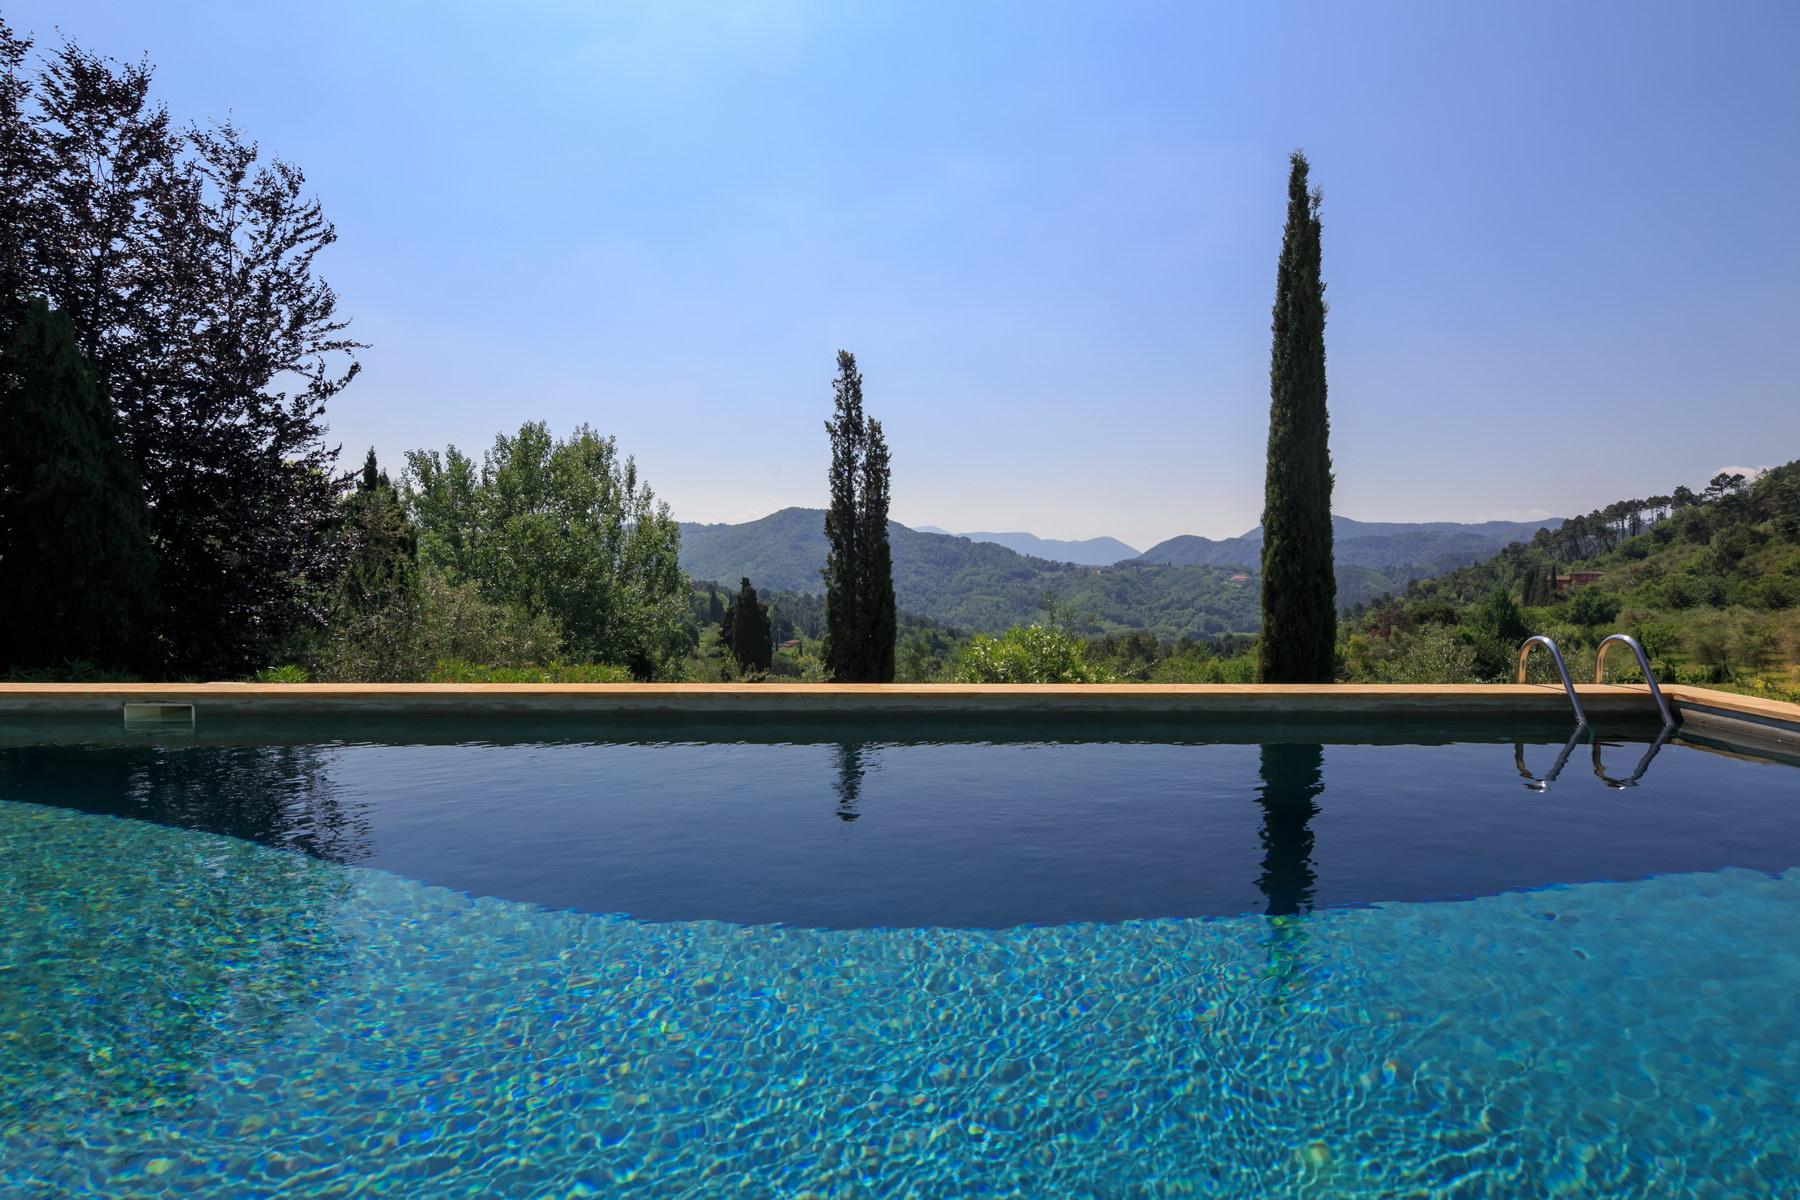 Villa in Vendita a Lucca: 5 locali, 1500 mq - Foto 16